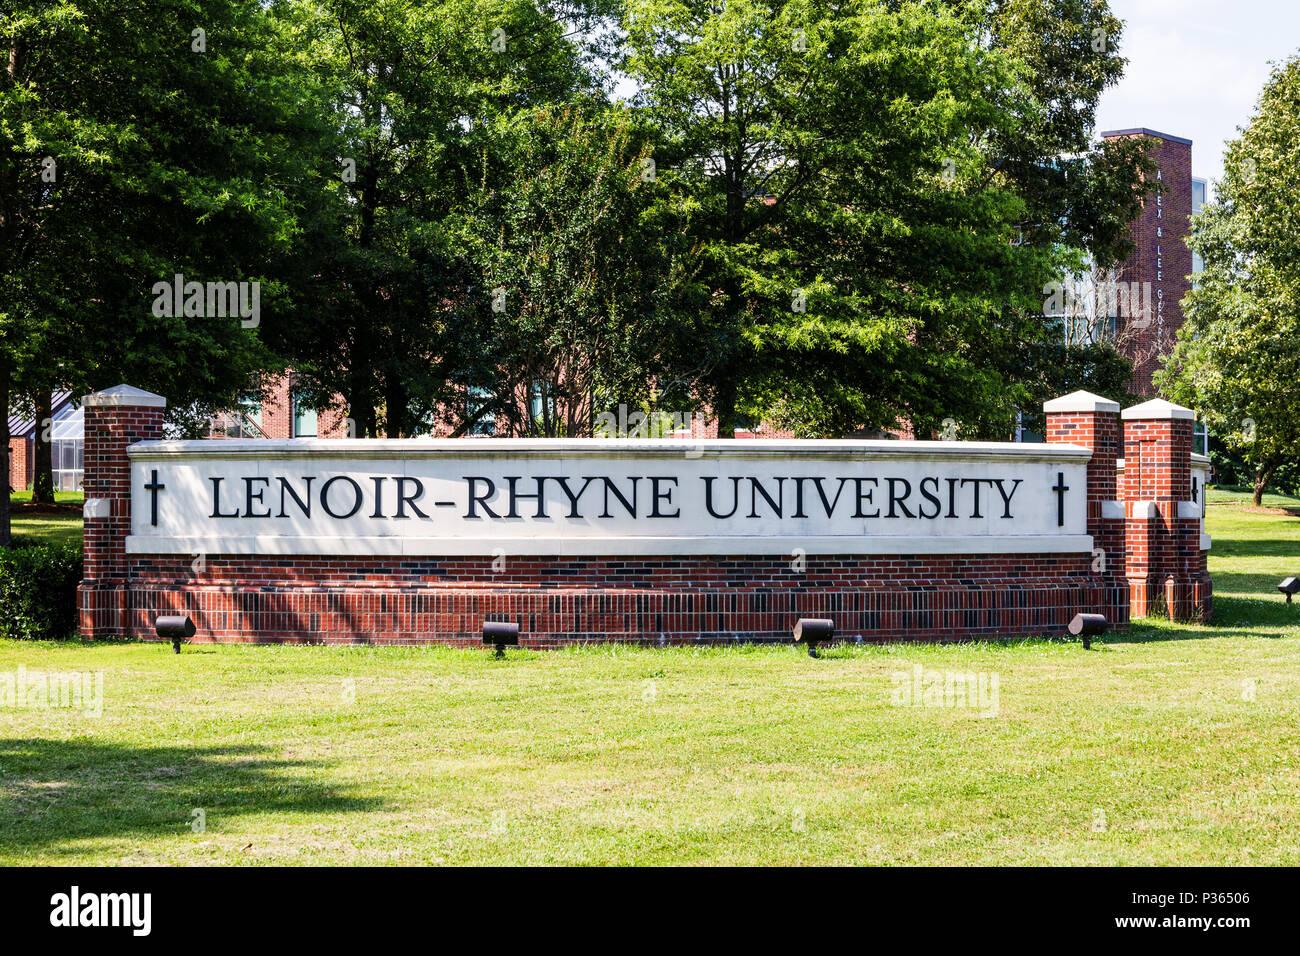 HICKORY, NC, USA-9 JUNE 18: A brick sign identifying the Lenoir-Rhyne University campus. - Stock Image